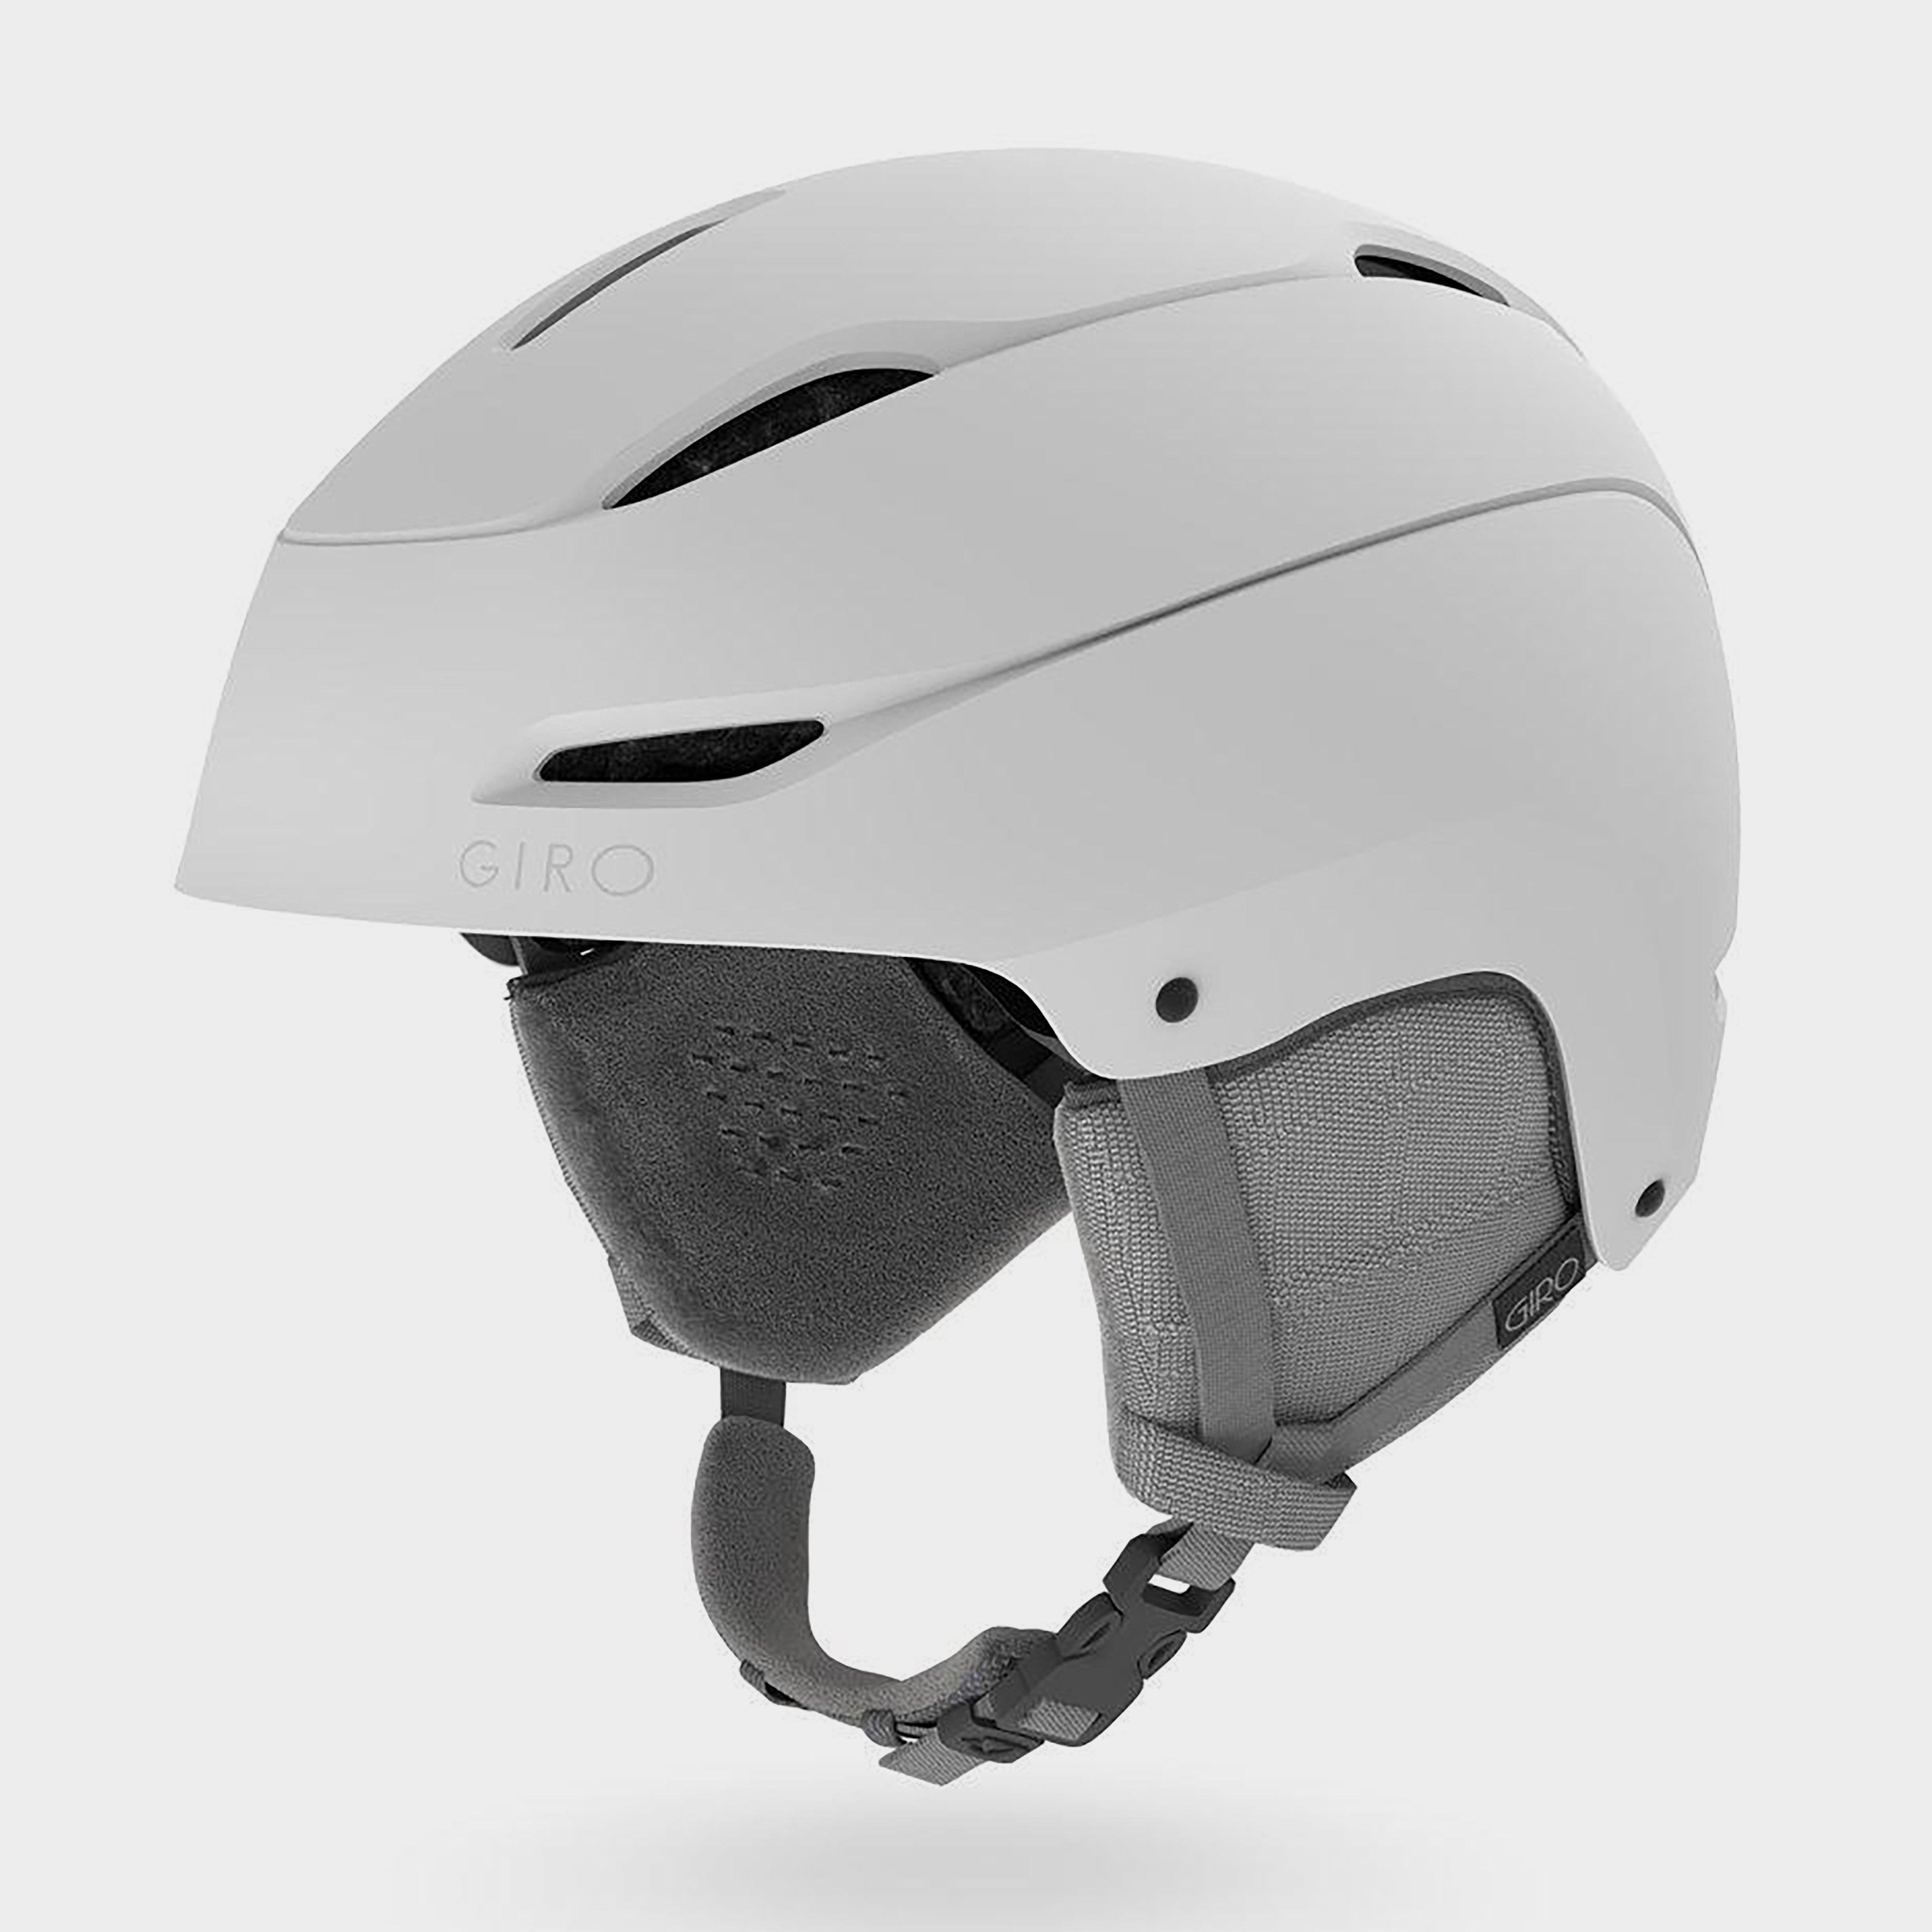 GIRO Women's Ceva Snow Helmet, WHT/WHT